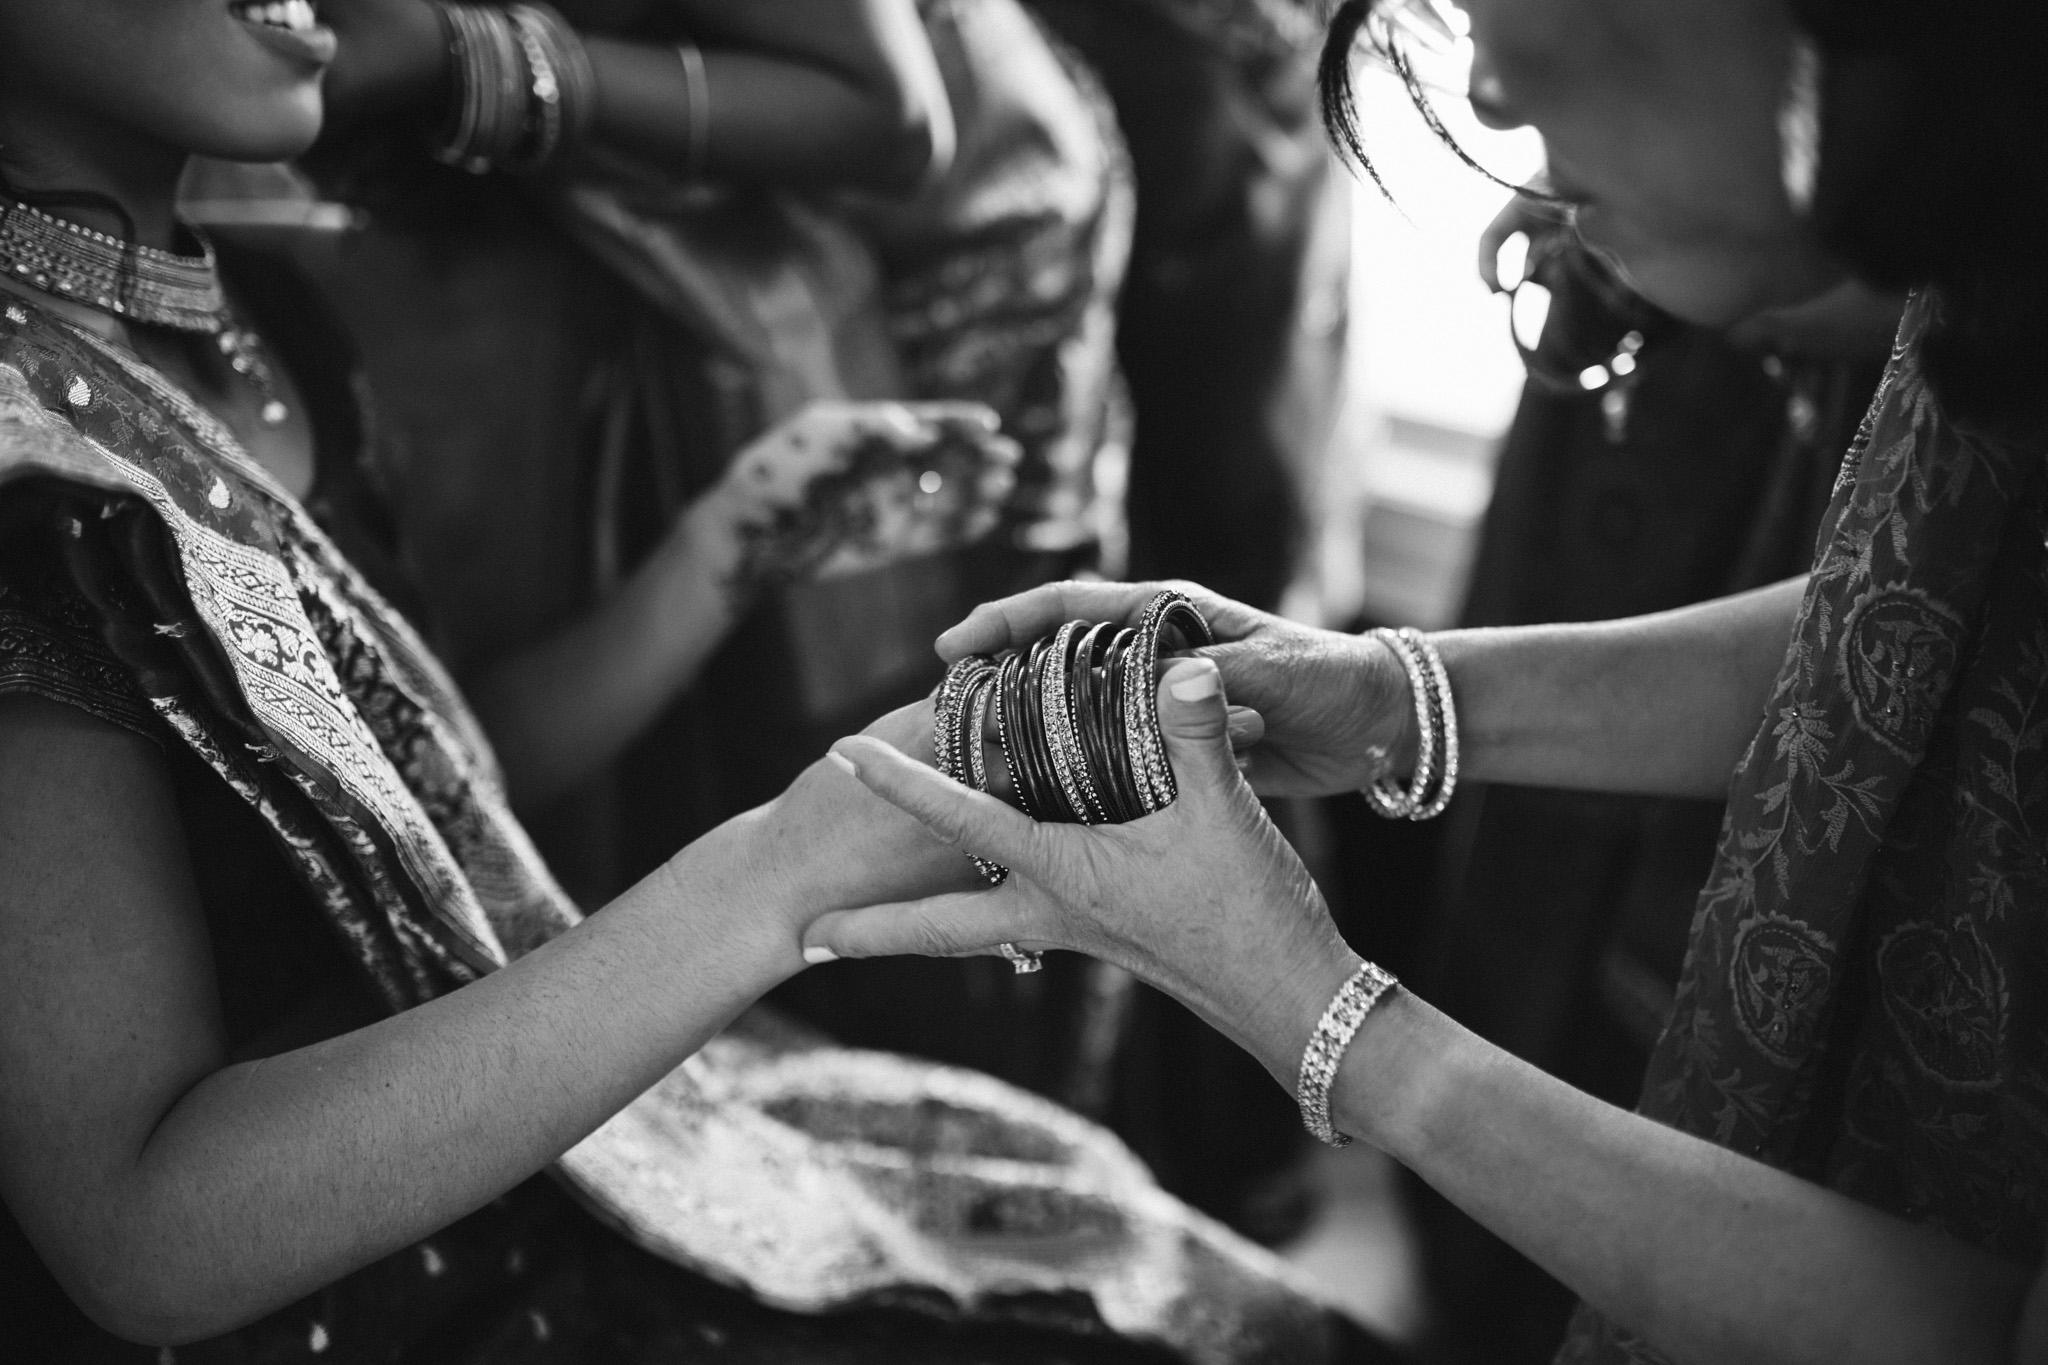 rebeccaburtphotography.hindiwedding.moraisvineyards.virginiawedding-31.JPG